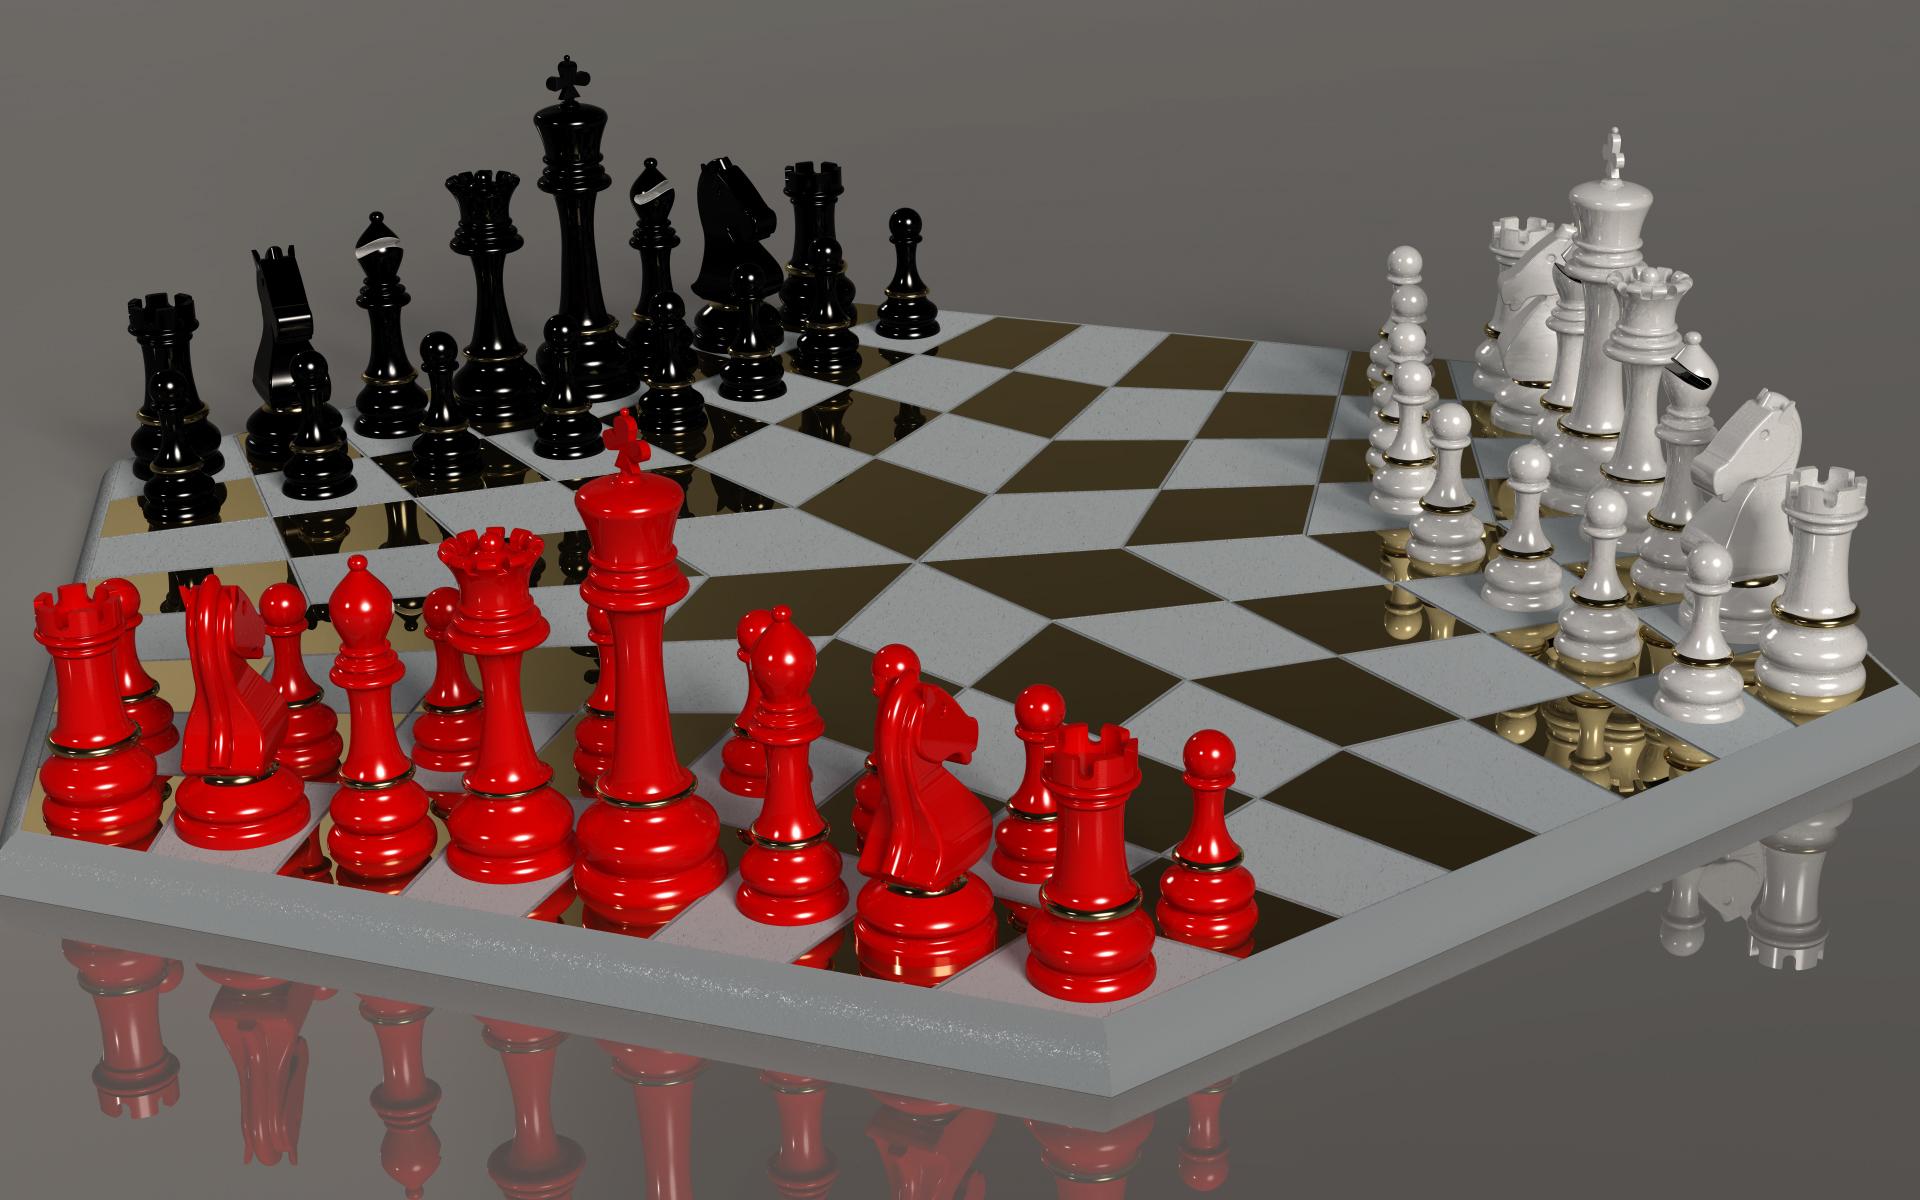 wallpaper_chess-for-three_b_1920x1200.jpg